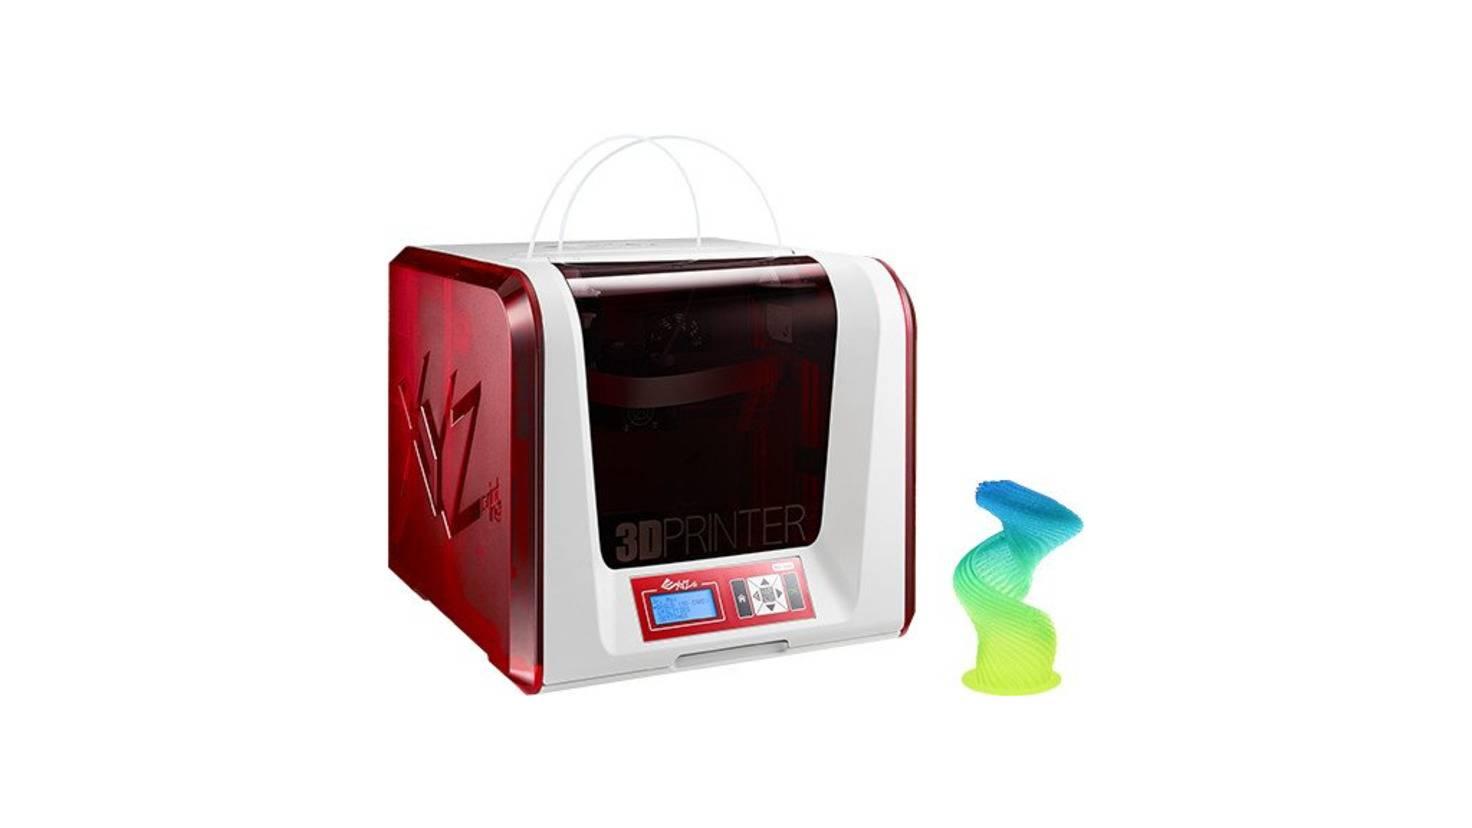 xyzprinting-da-vinci-jr-20-mix-imprimante-3d